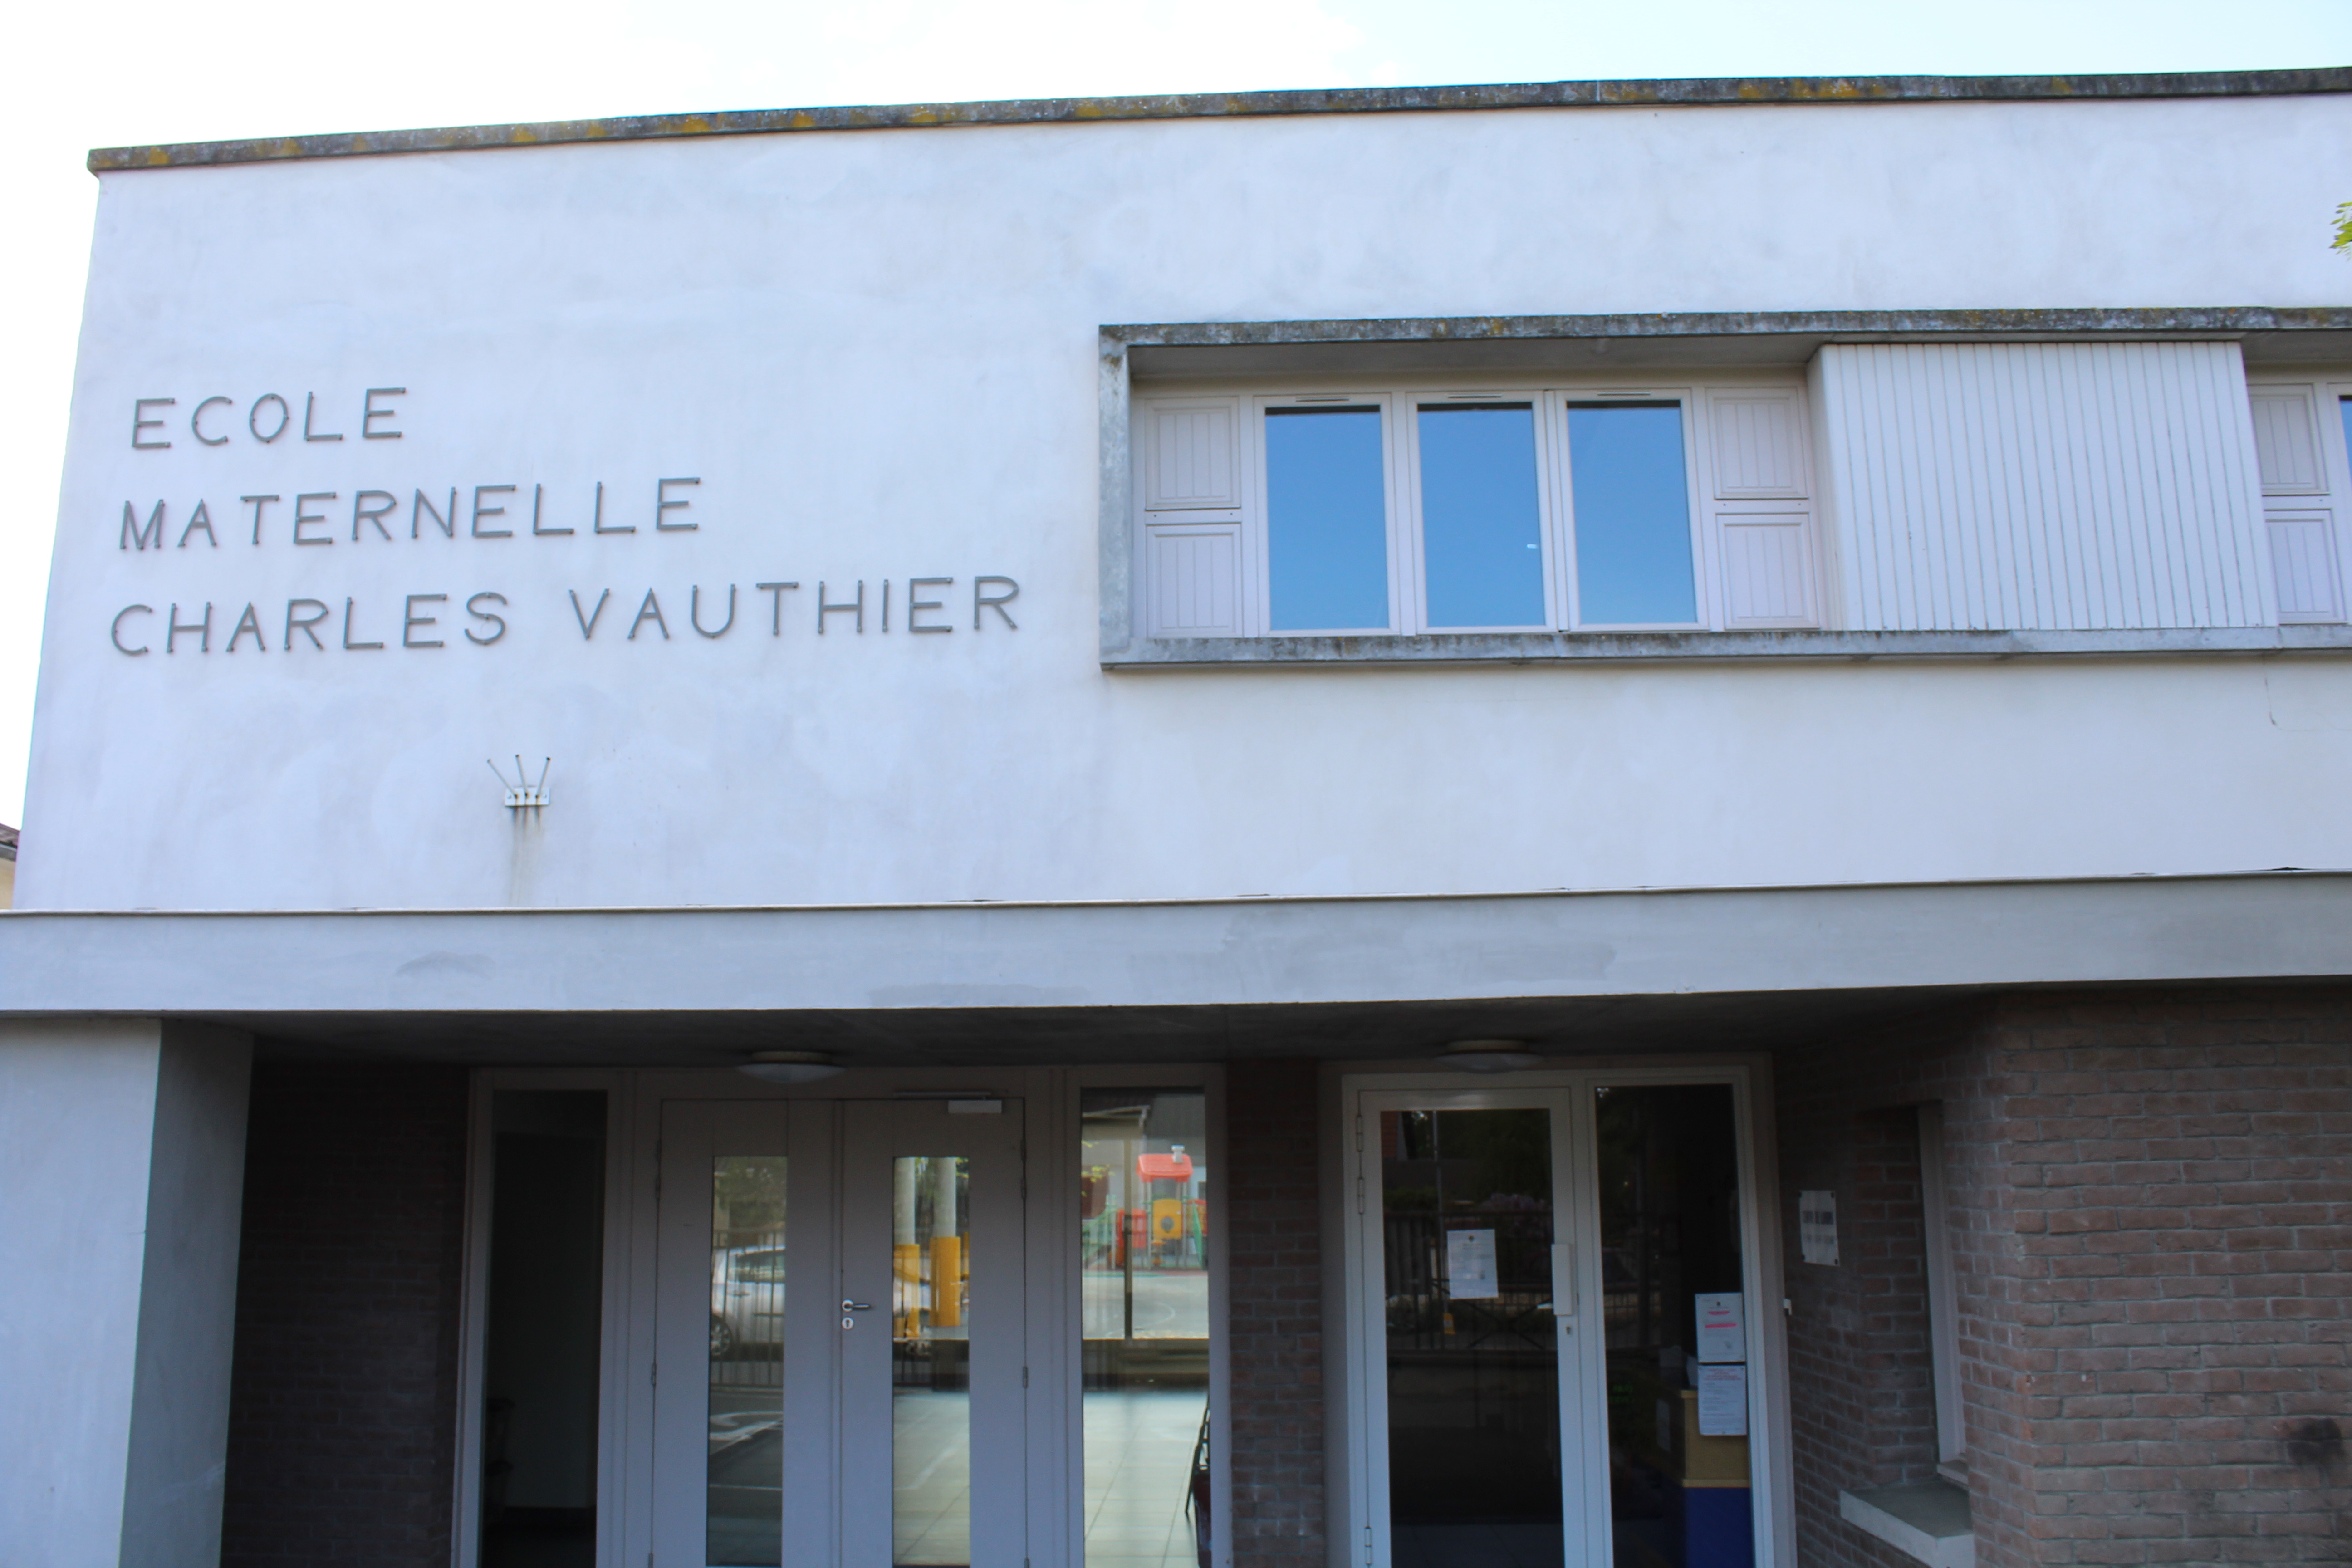 Ecole Maternelle.JPG